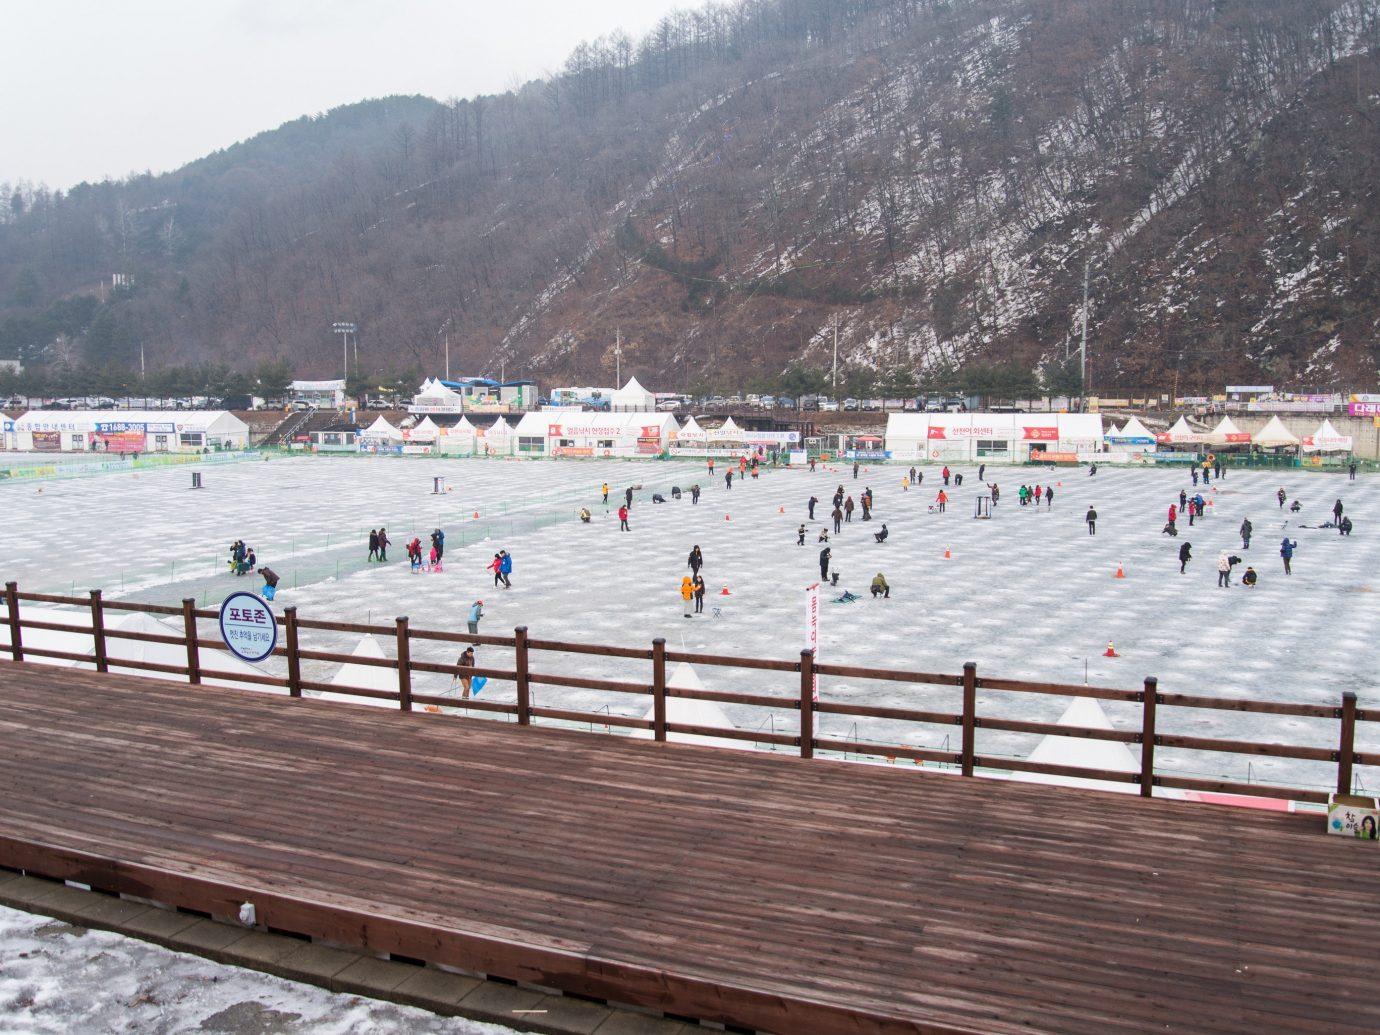 City Seoul Trip Ideas sport venue structure race race track Winter snow sky roof recreation tree sports leisure